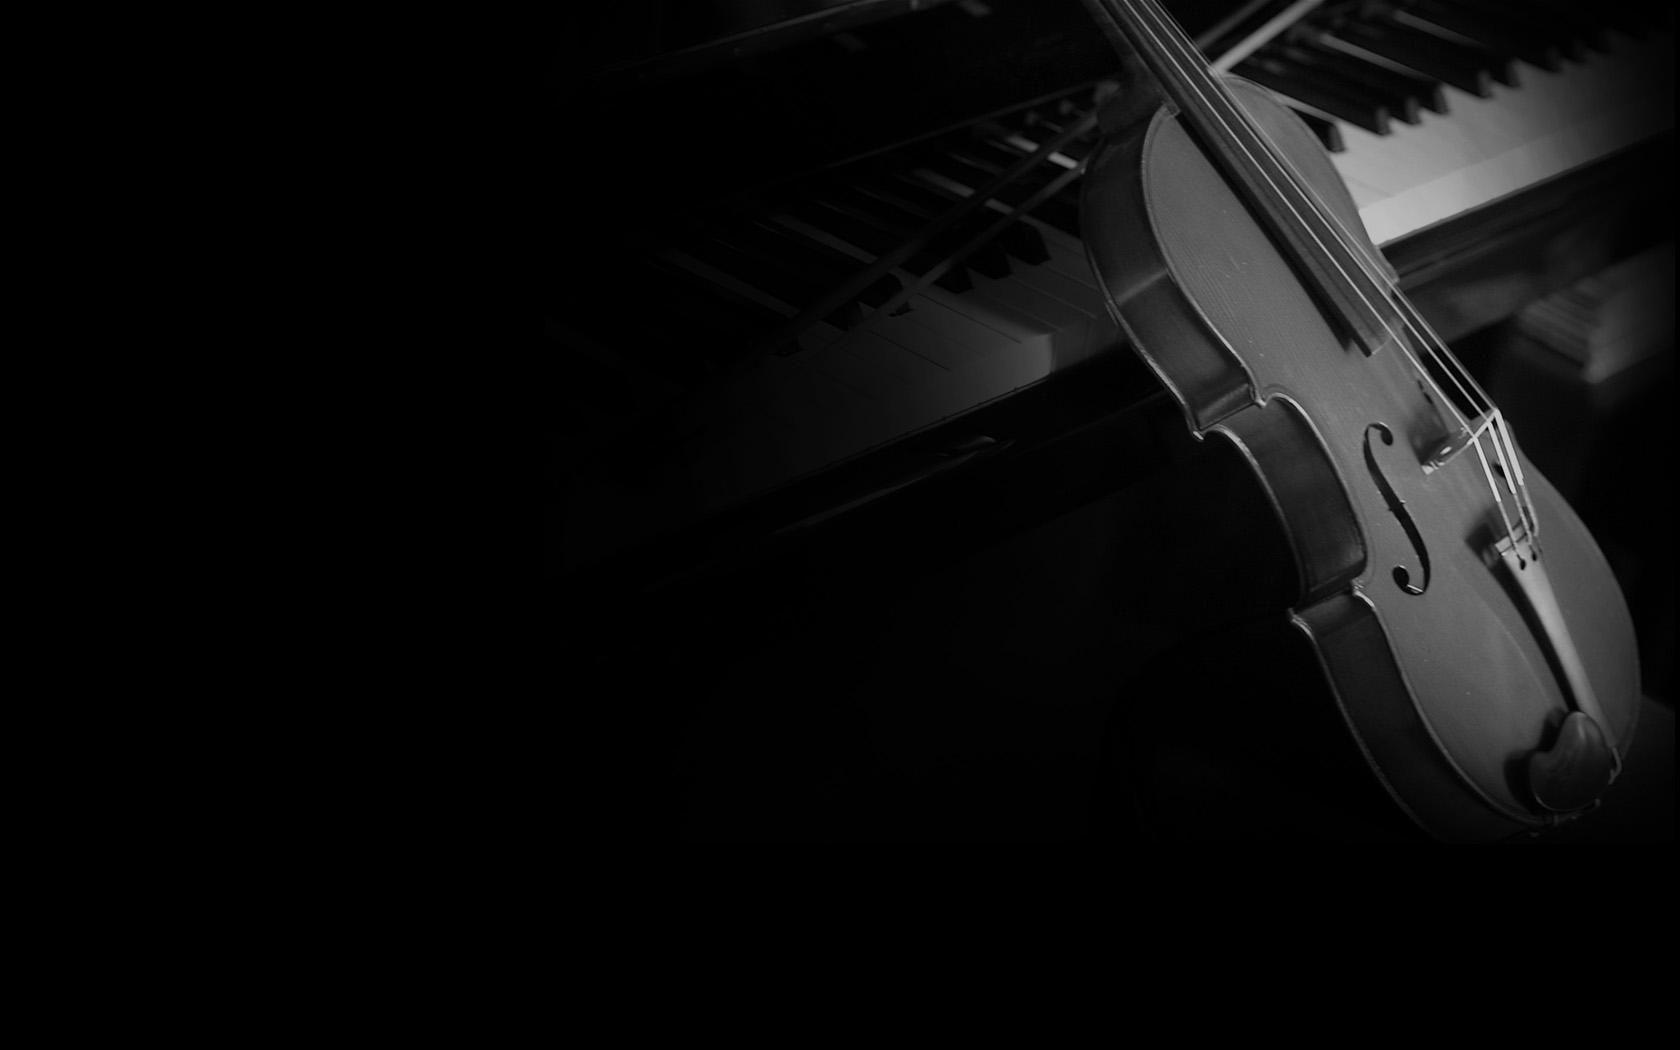 Black Violin Wallpapers Top Free Black Violin Backgrounds Wallpaperaccess